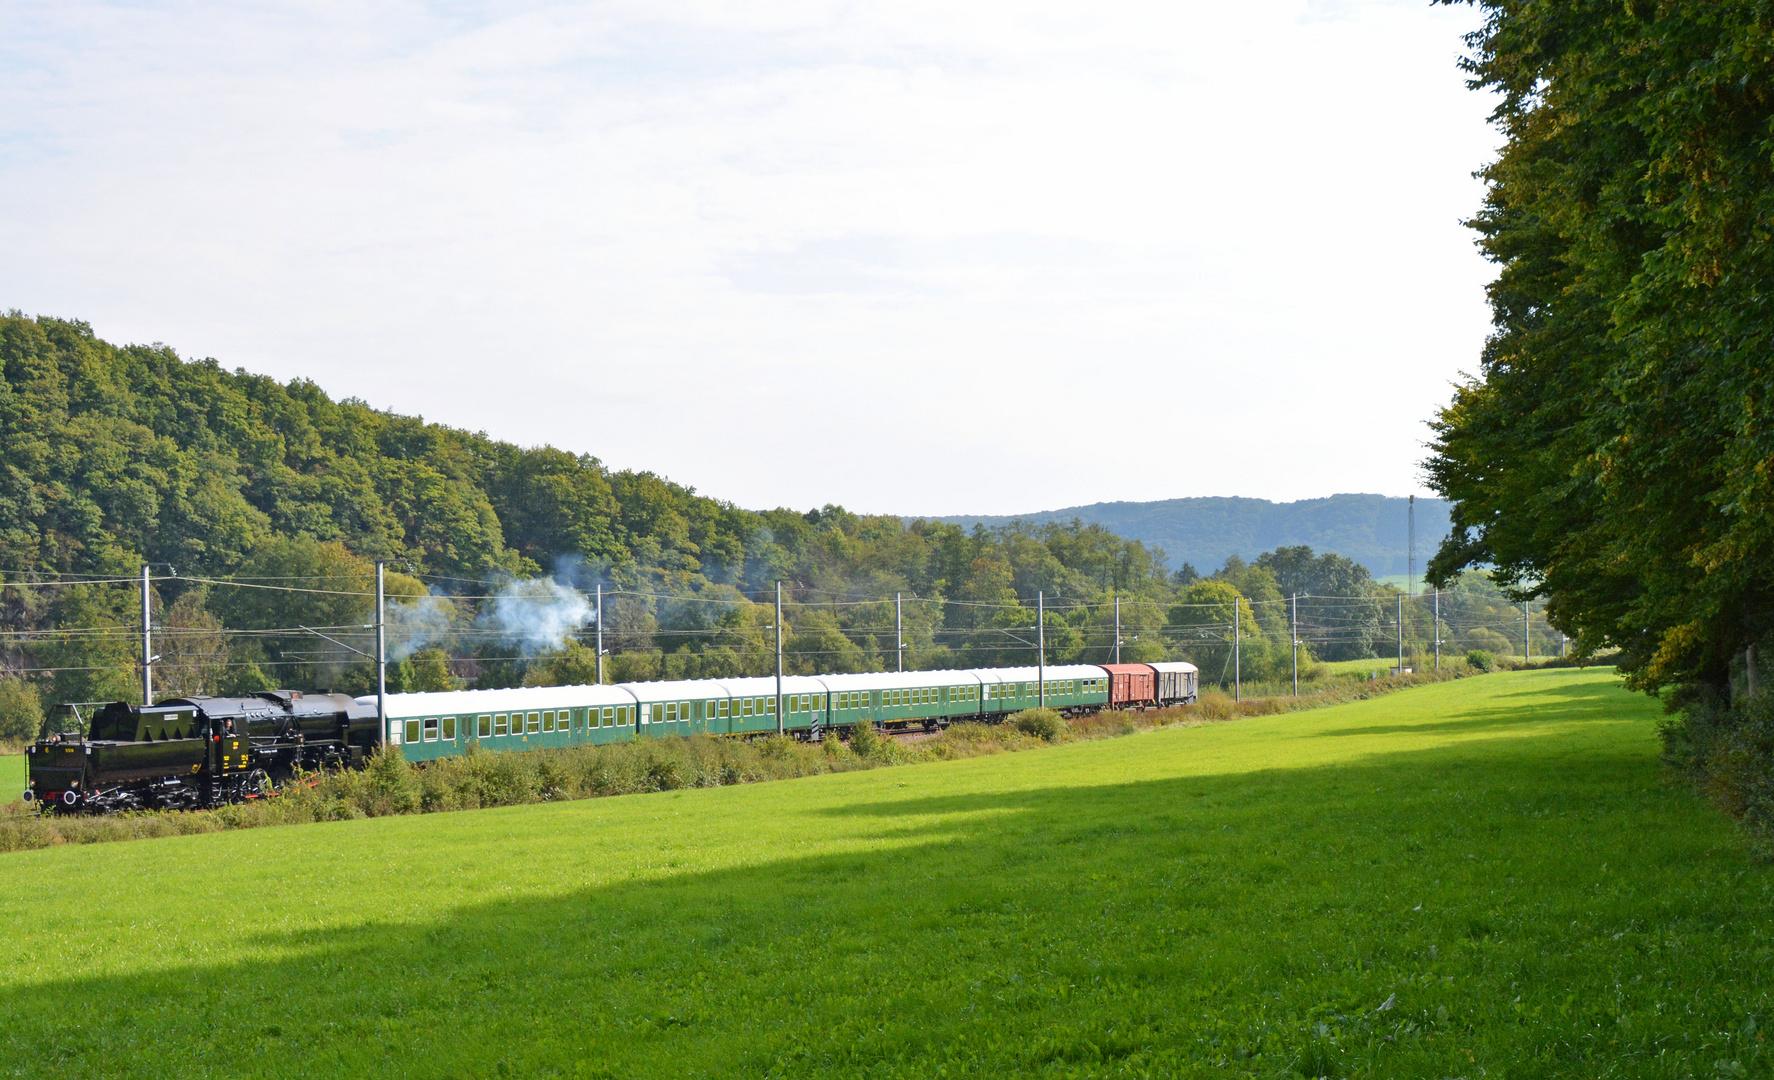 Charterfahrt Part II